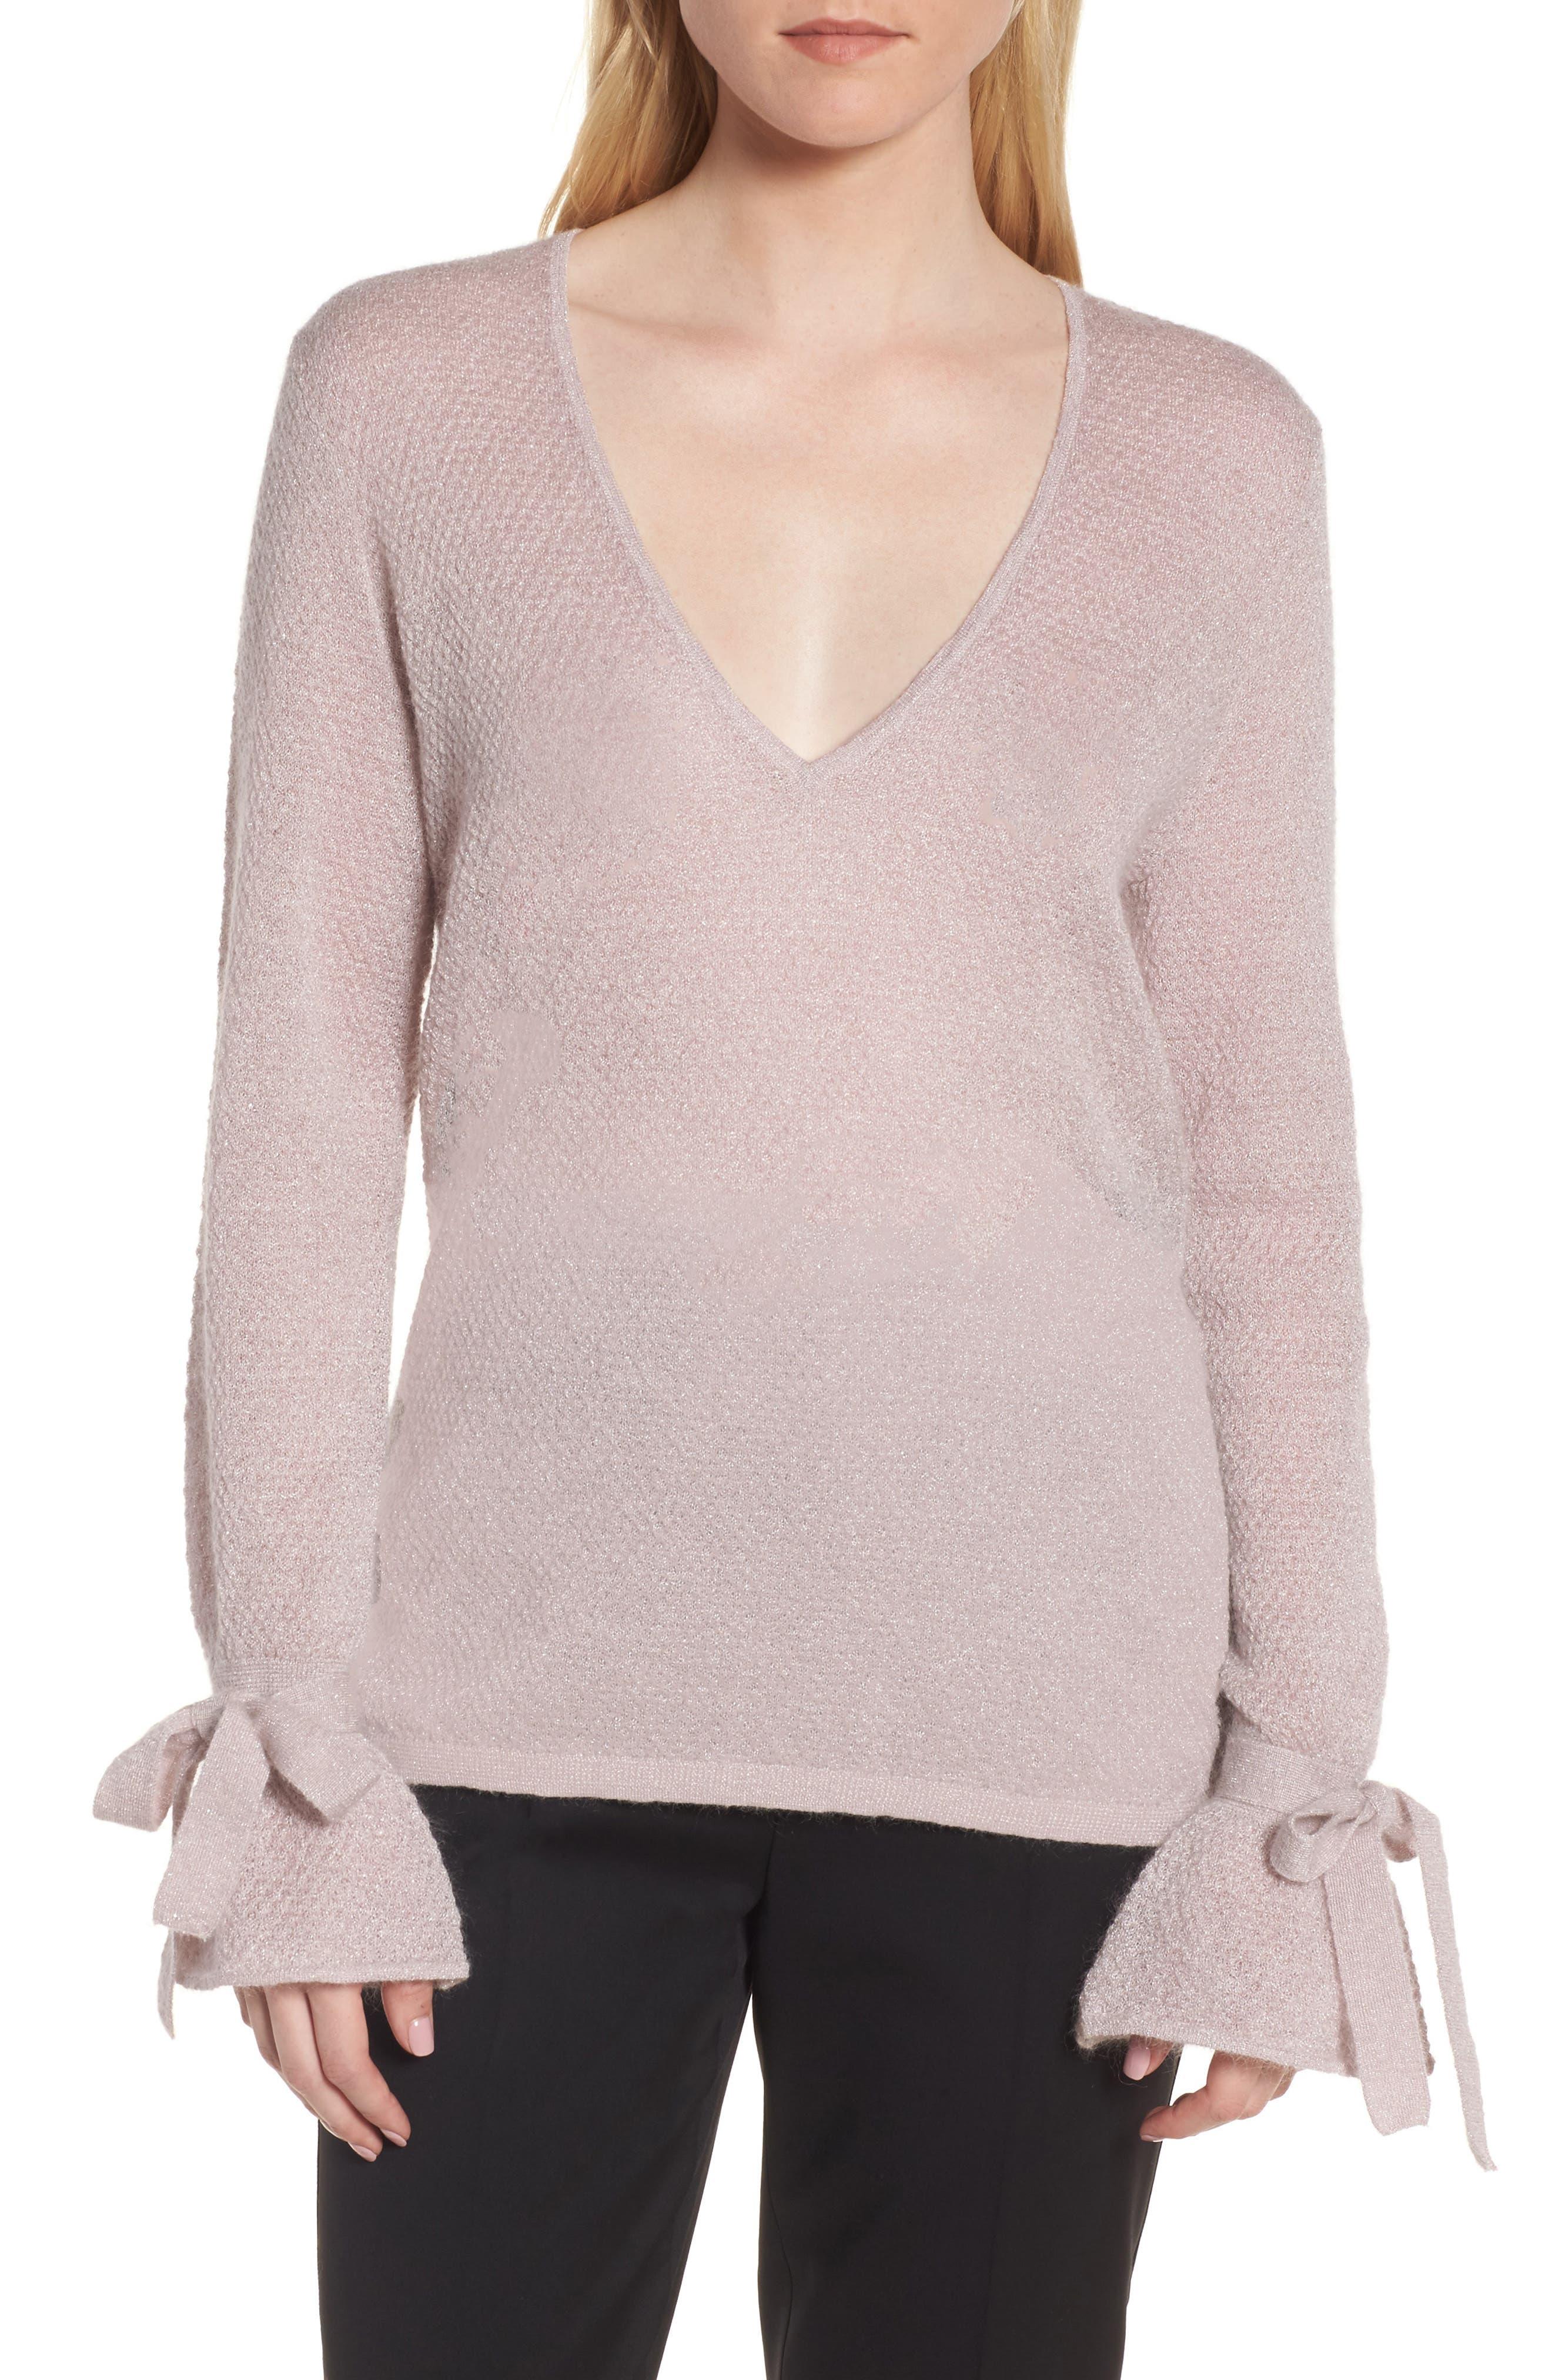 Alternate Image 1 Selected - Lewit Metallic Mohair Blend Sweater